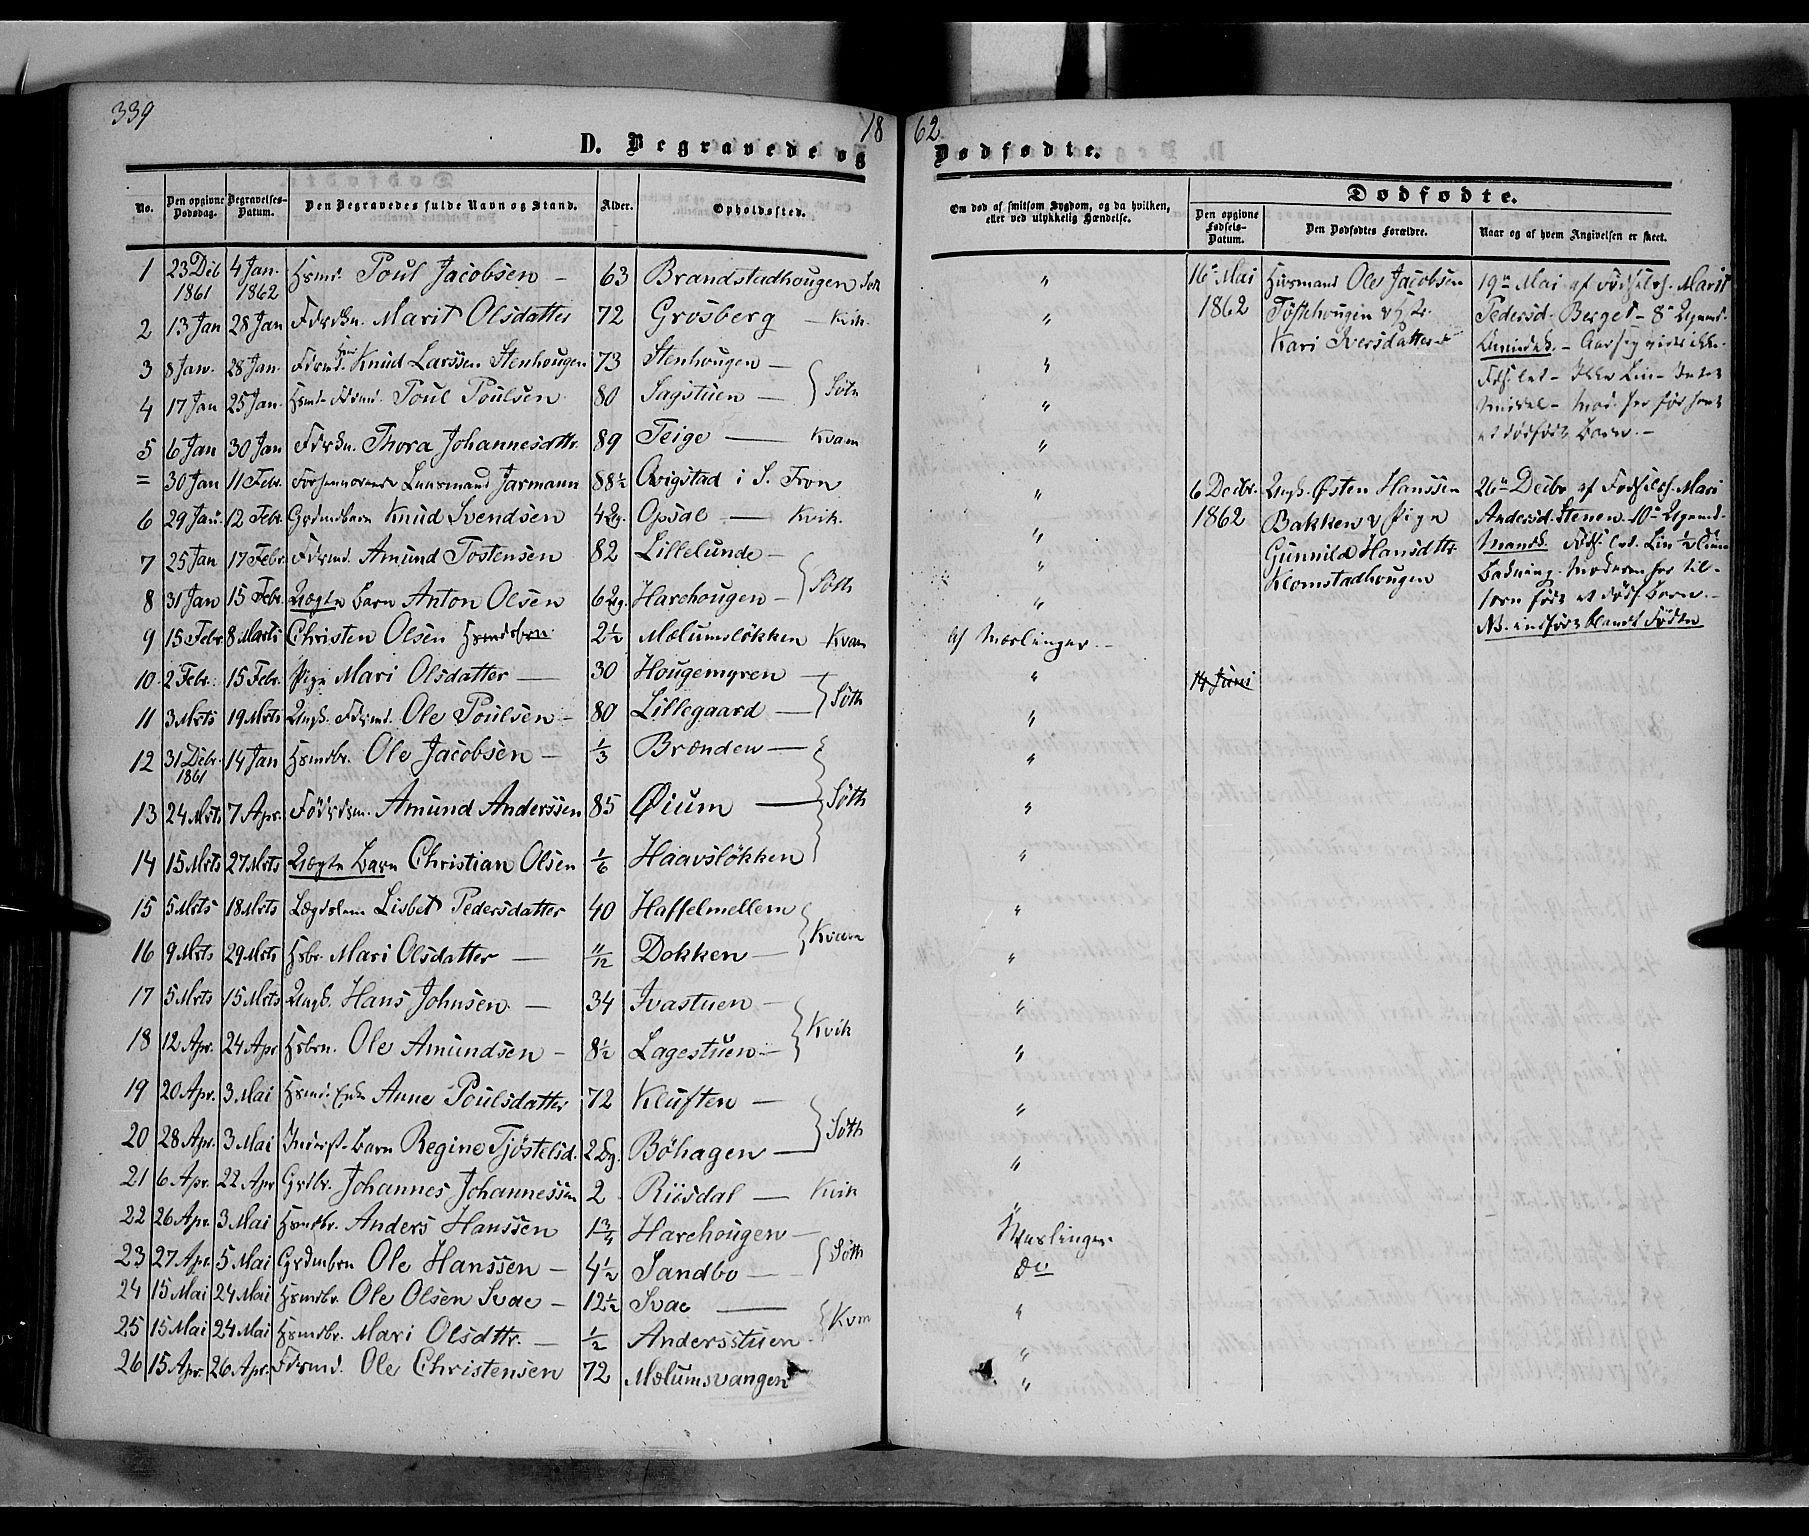 SAH, Nord-Fron prestekontor, Ministerialbok nr. 1, 1851-1864, s. 339